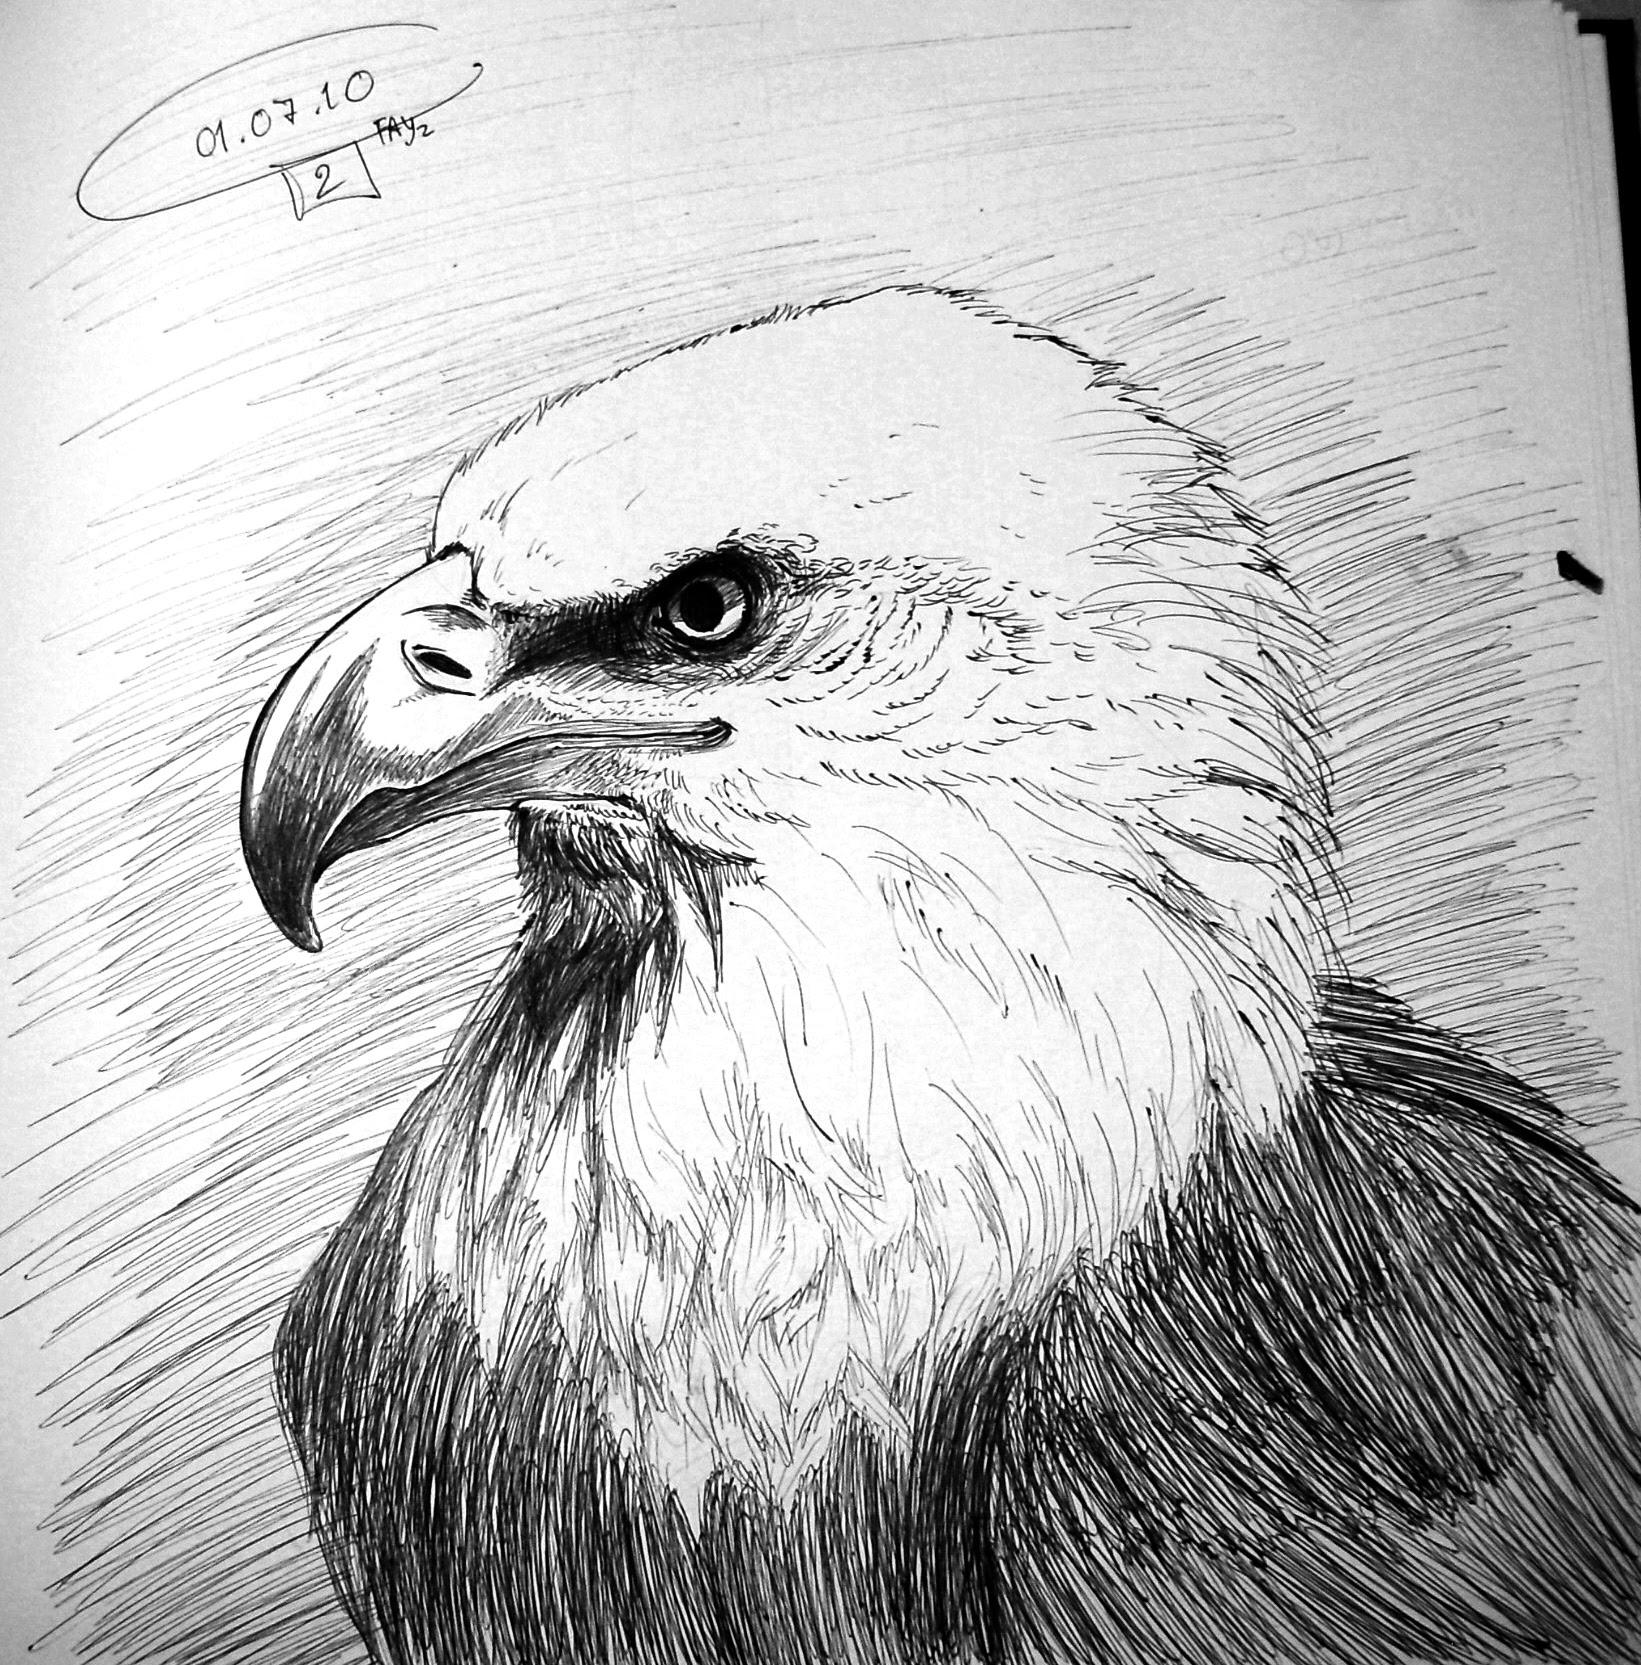 Simple Pencil Drawings Of Eagle - pencildrawing2019